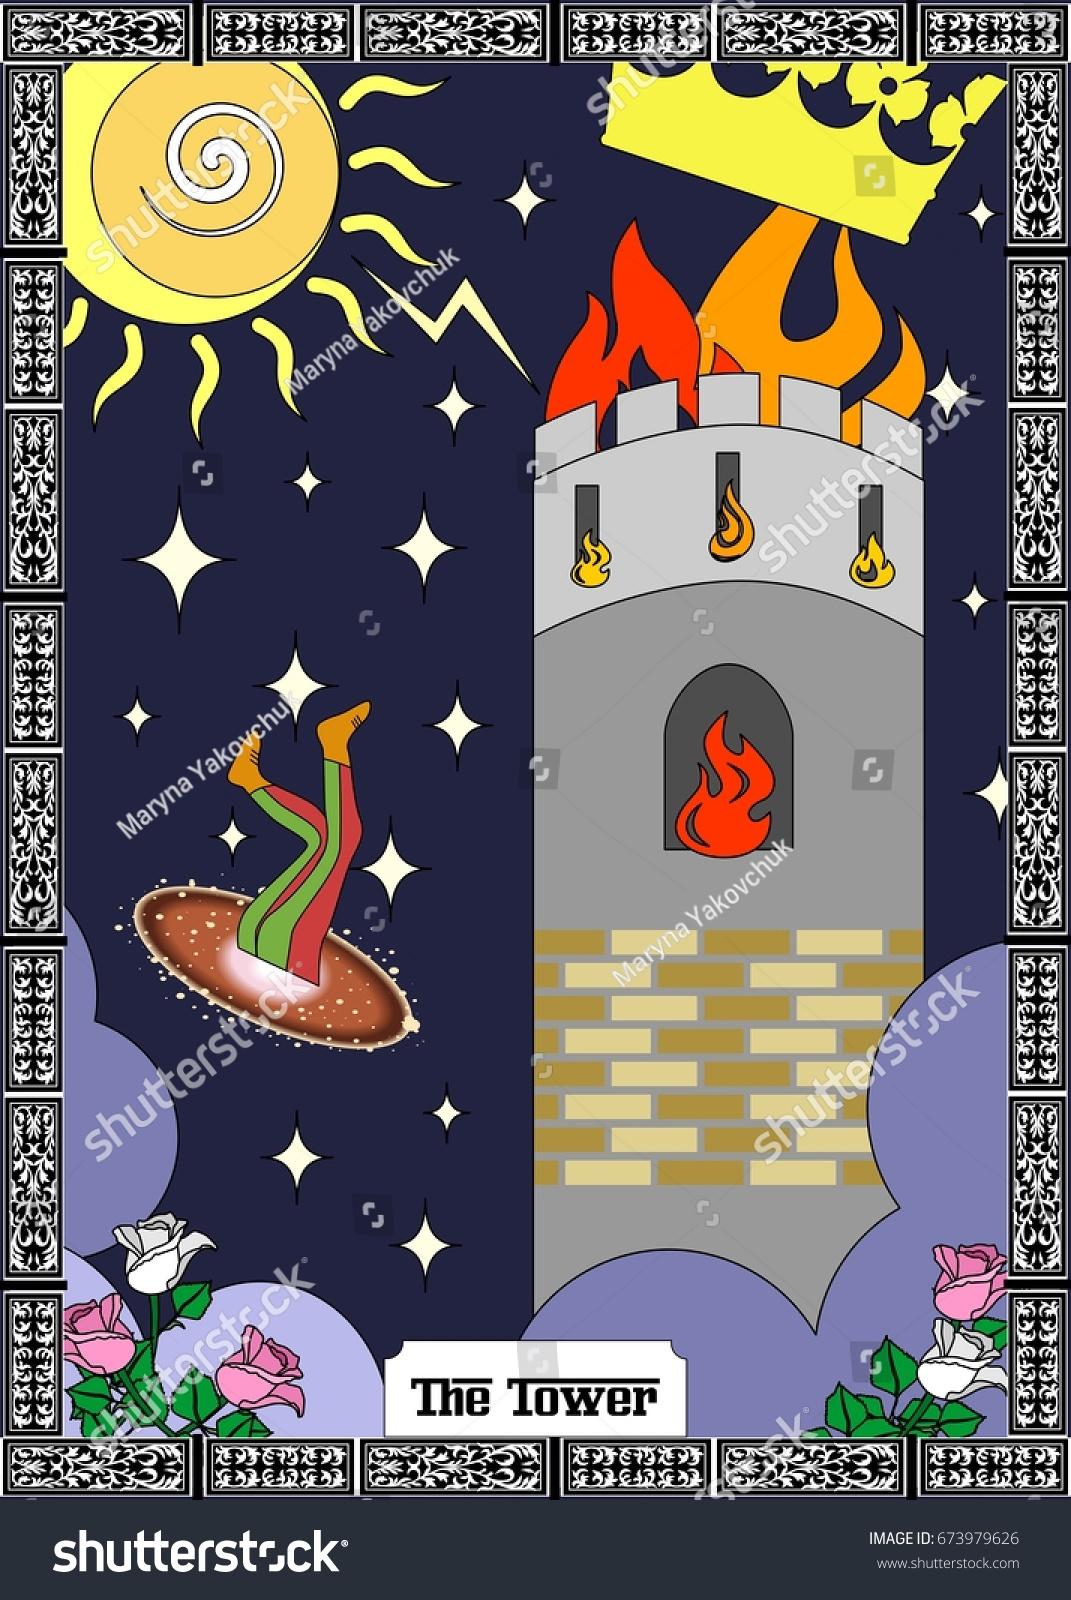 Illustration Card Tarot Tower Stock Vector (Royalty Free) 673979626